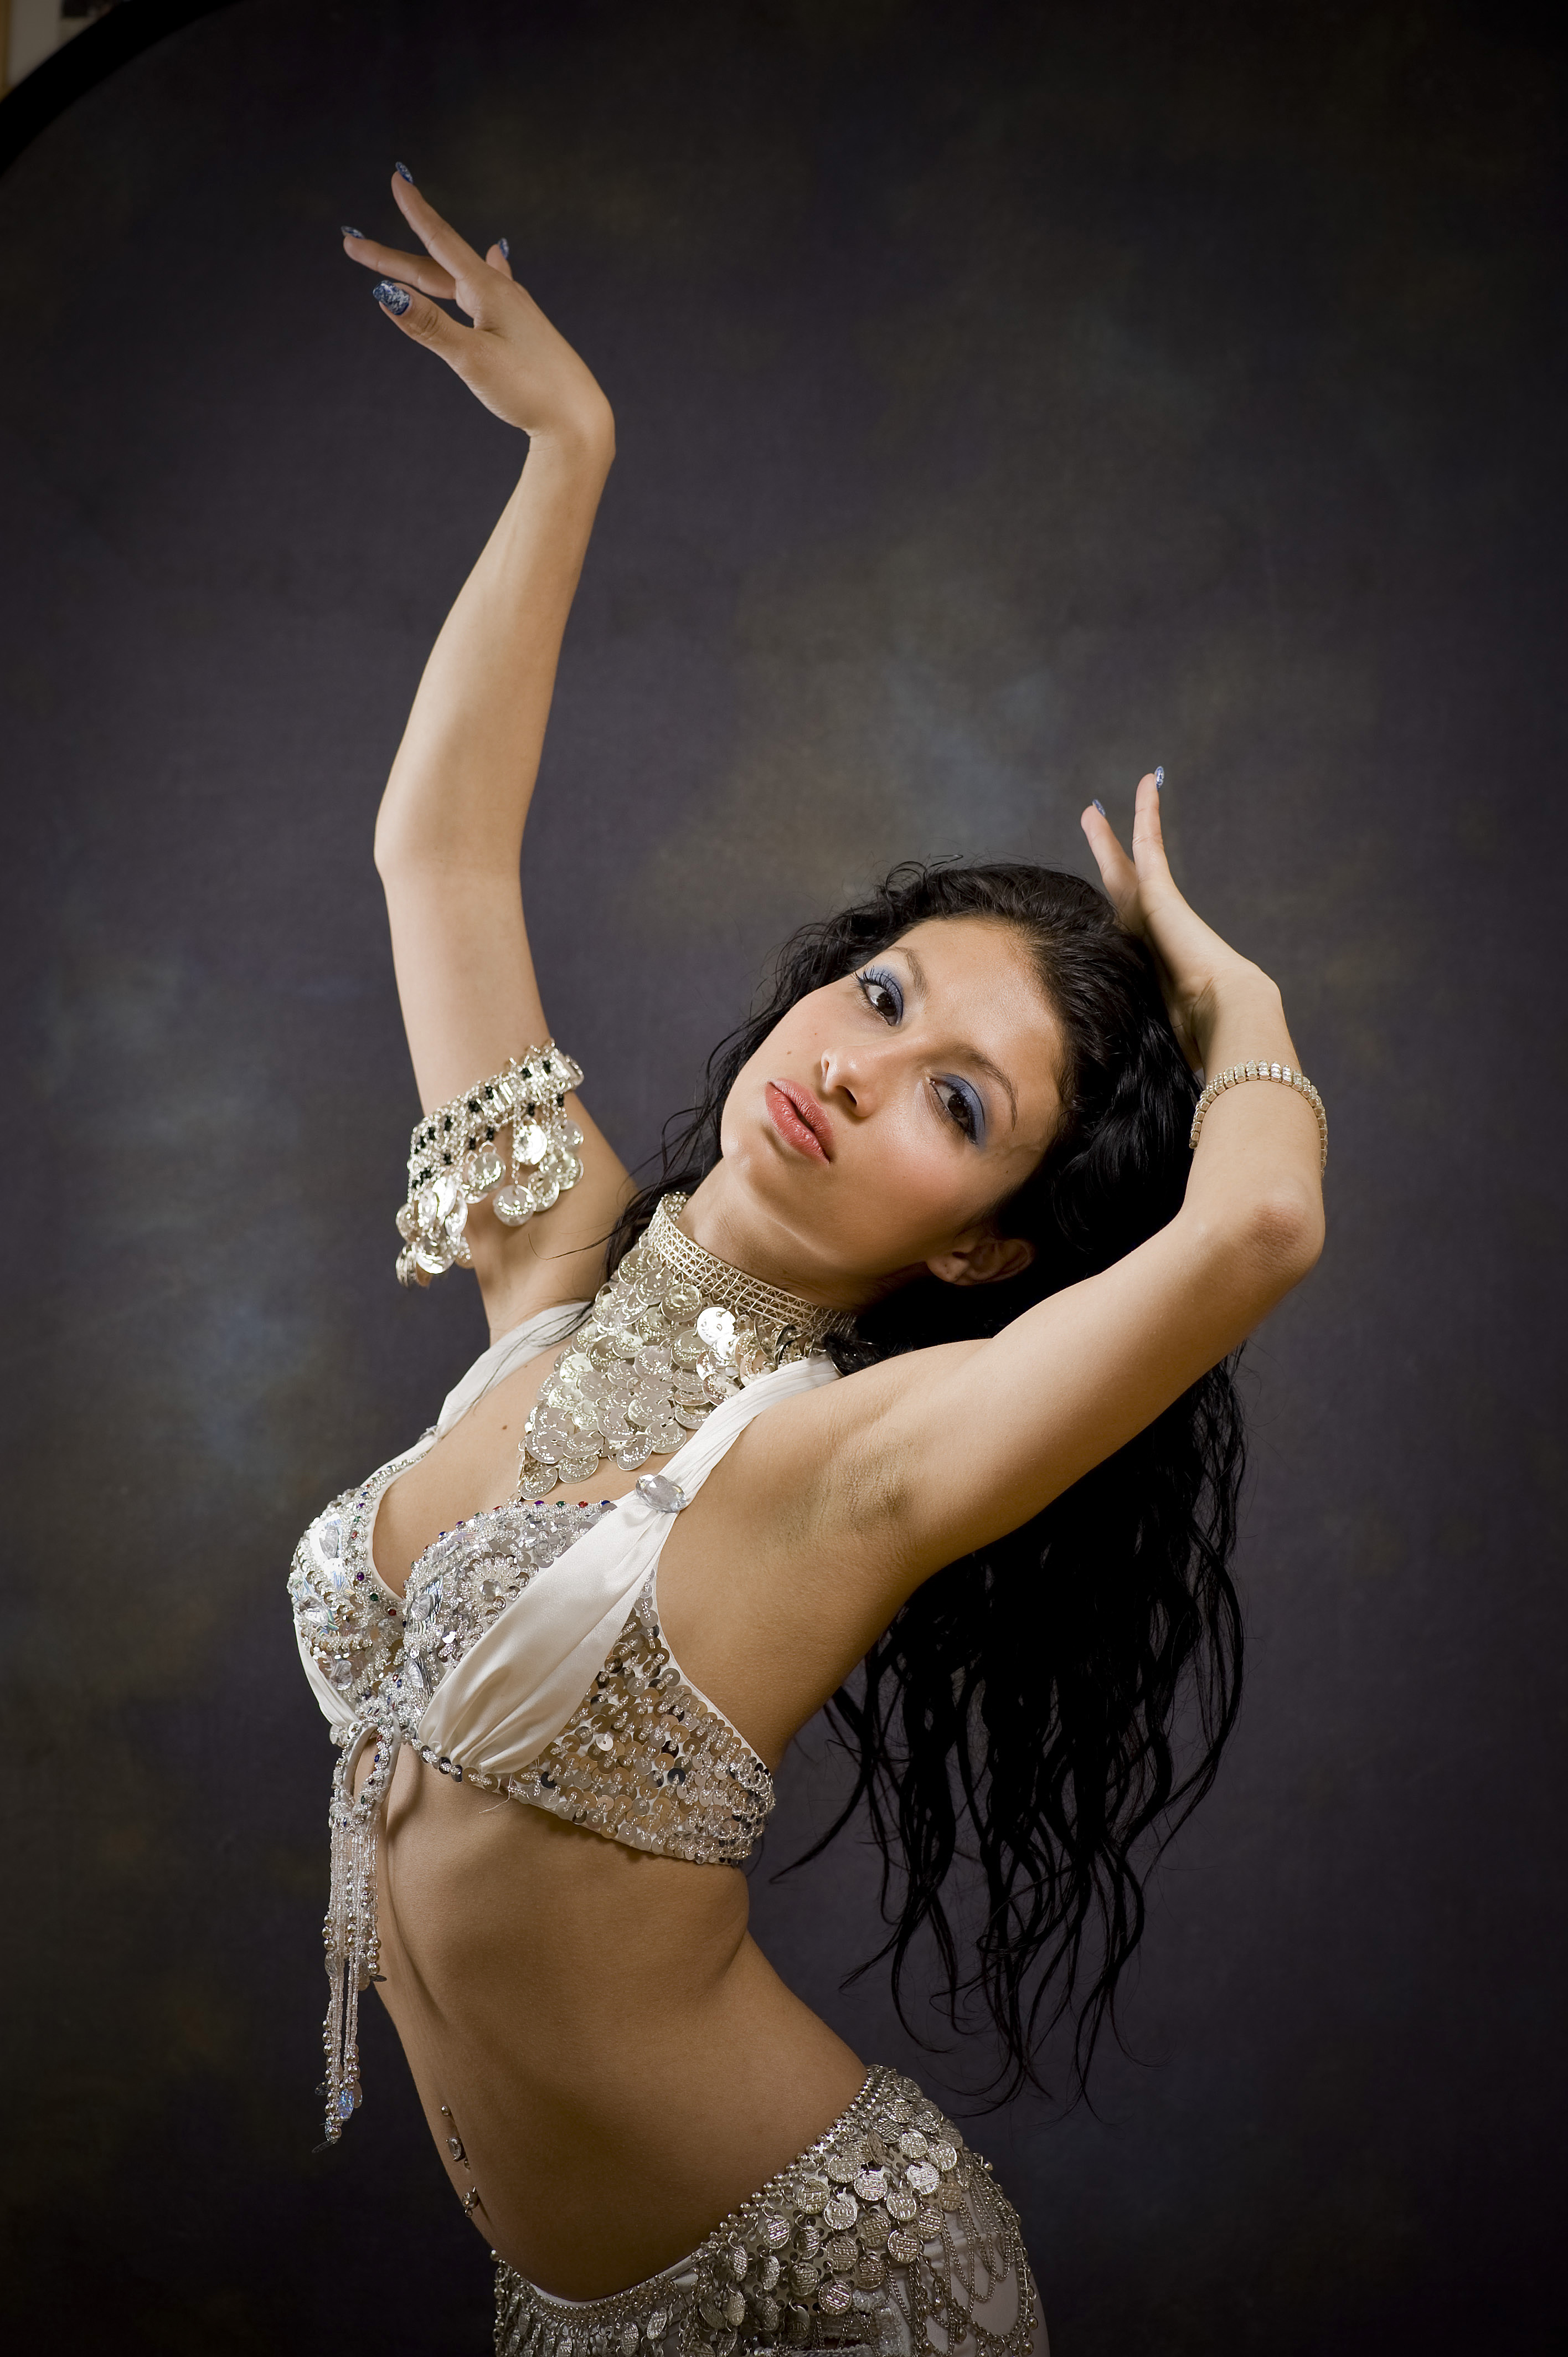 belly dance malta   Artemocionbellydance's Blog